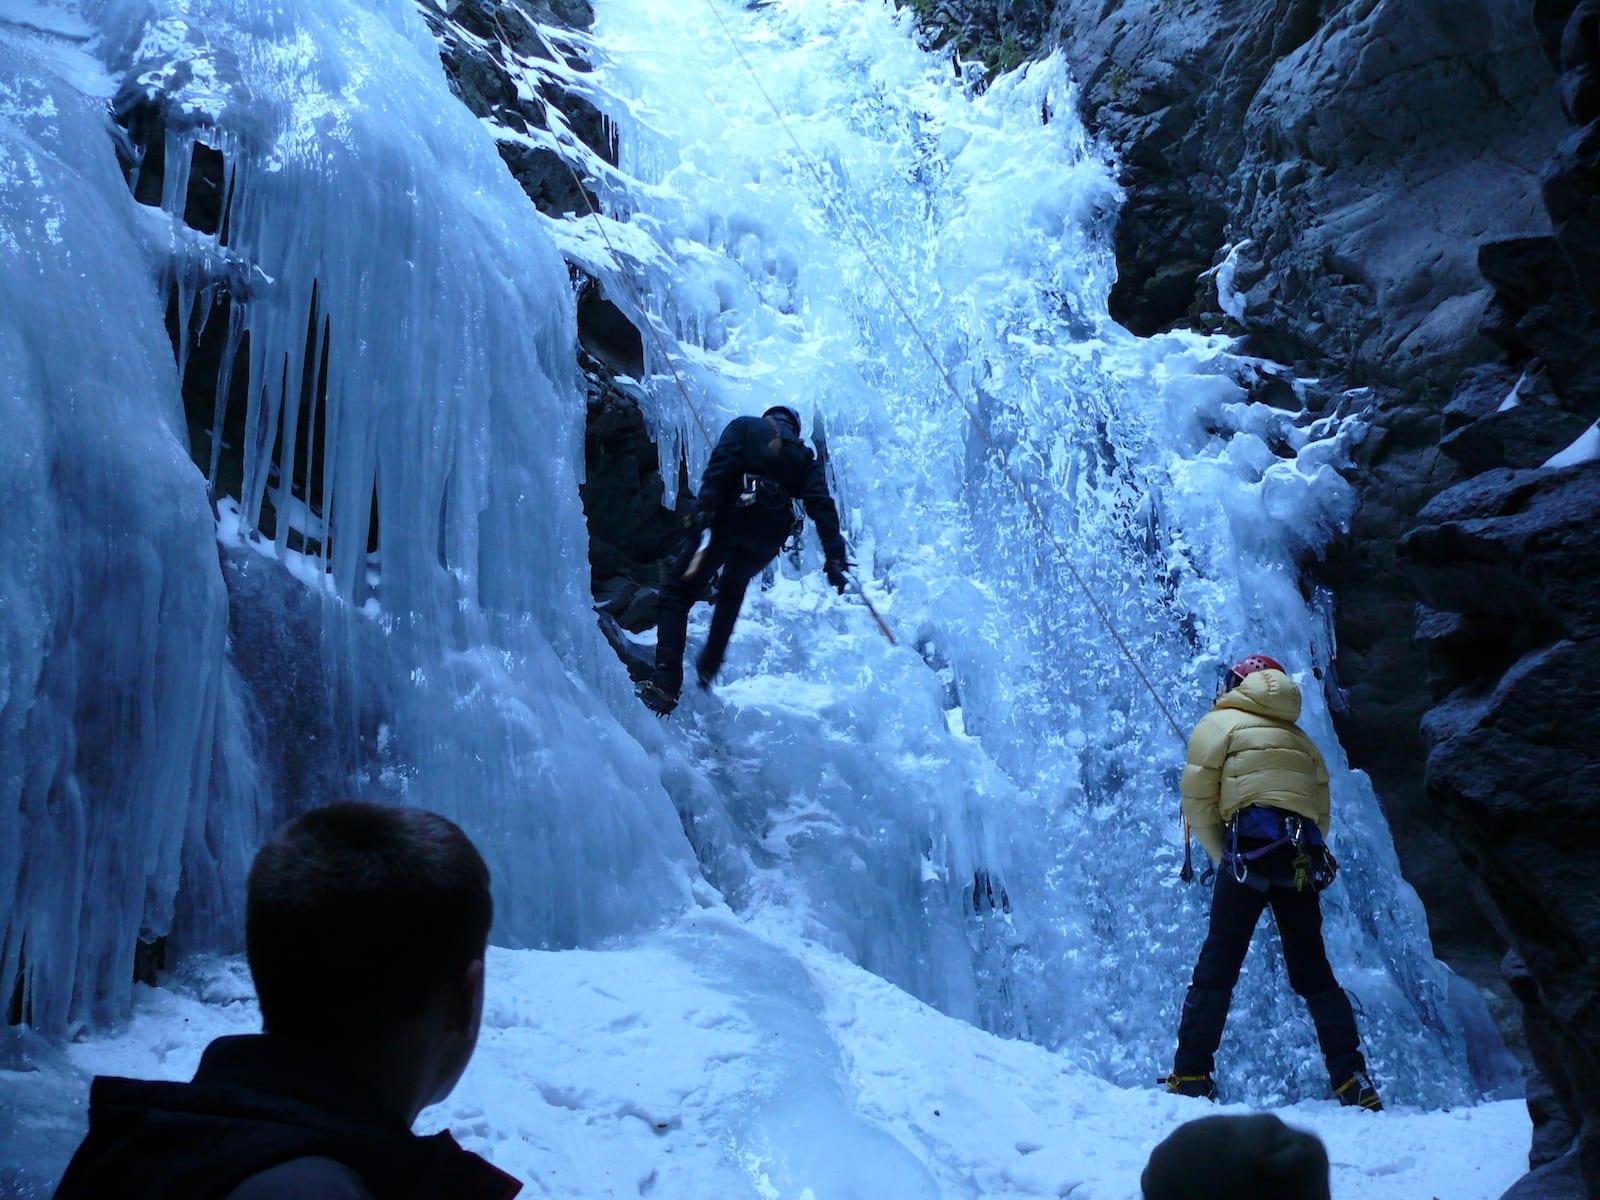 Zapta Falls Winter Ice Climbers